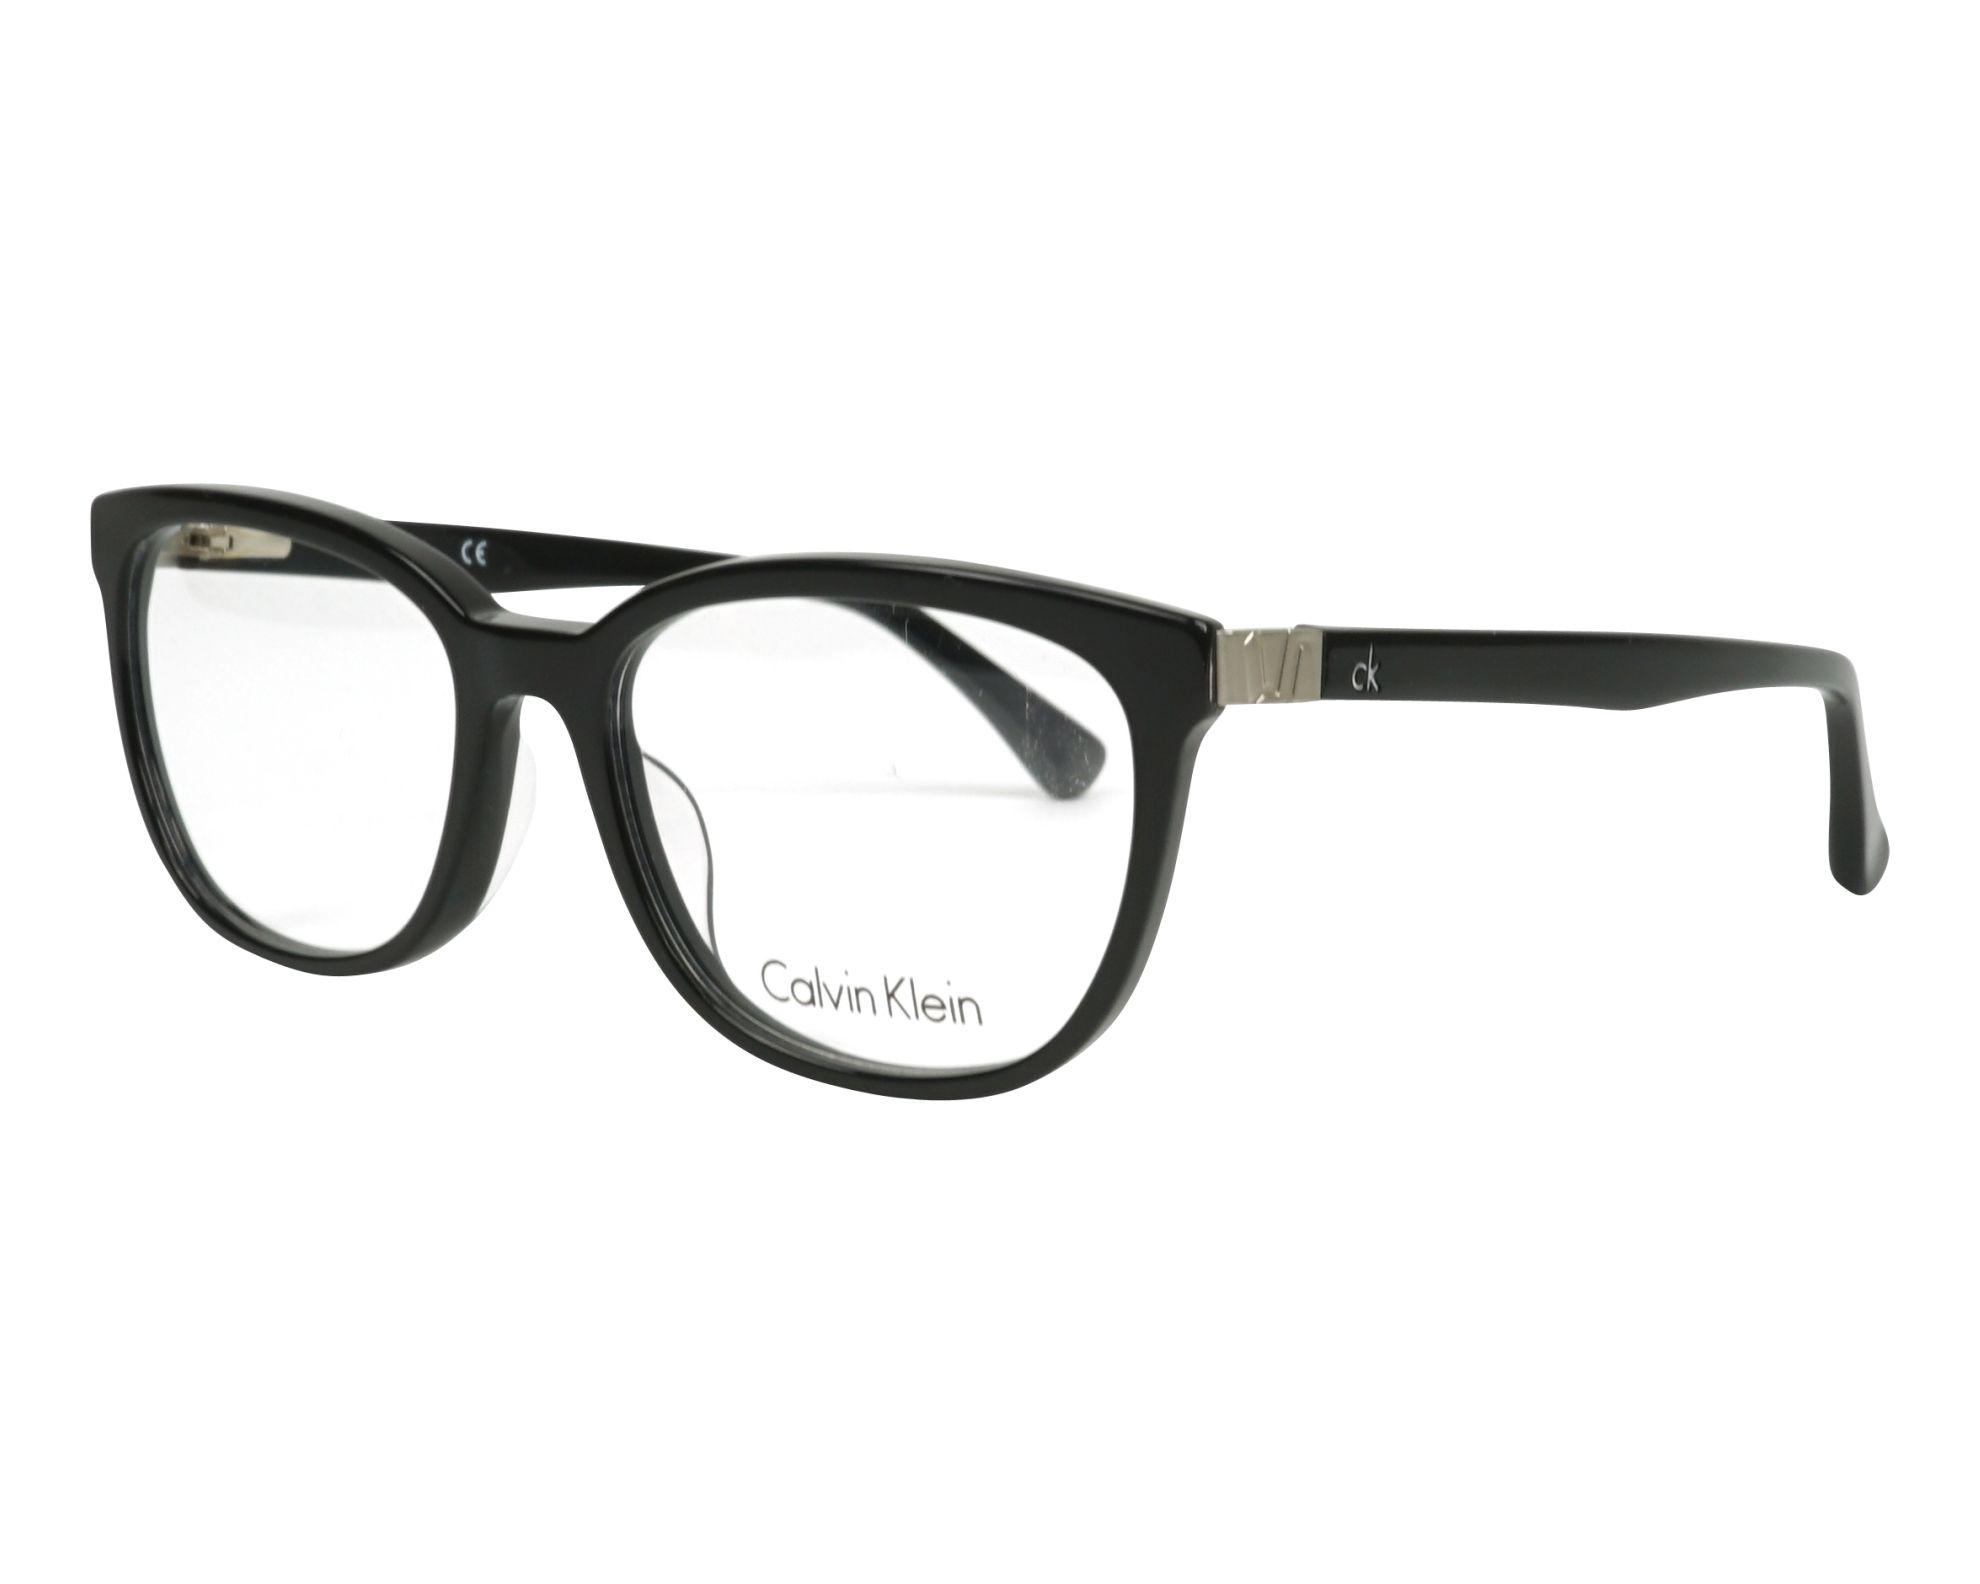 0998f977fc Gafas Graduadas Calvin Klein CK-5879 001 52-17 Negra vista de perfil